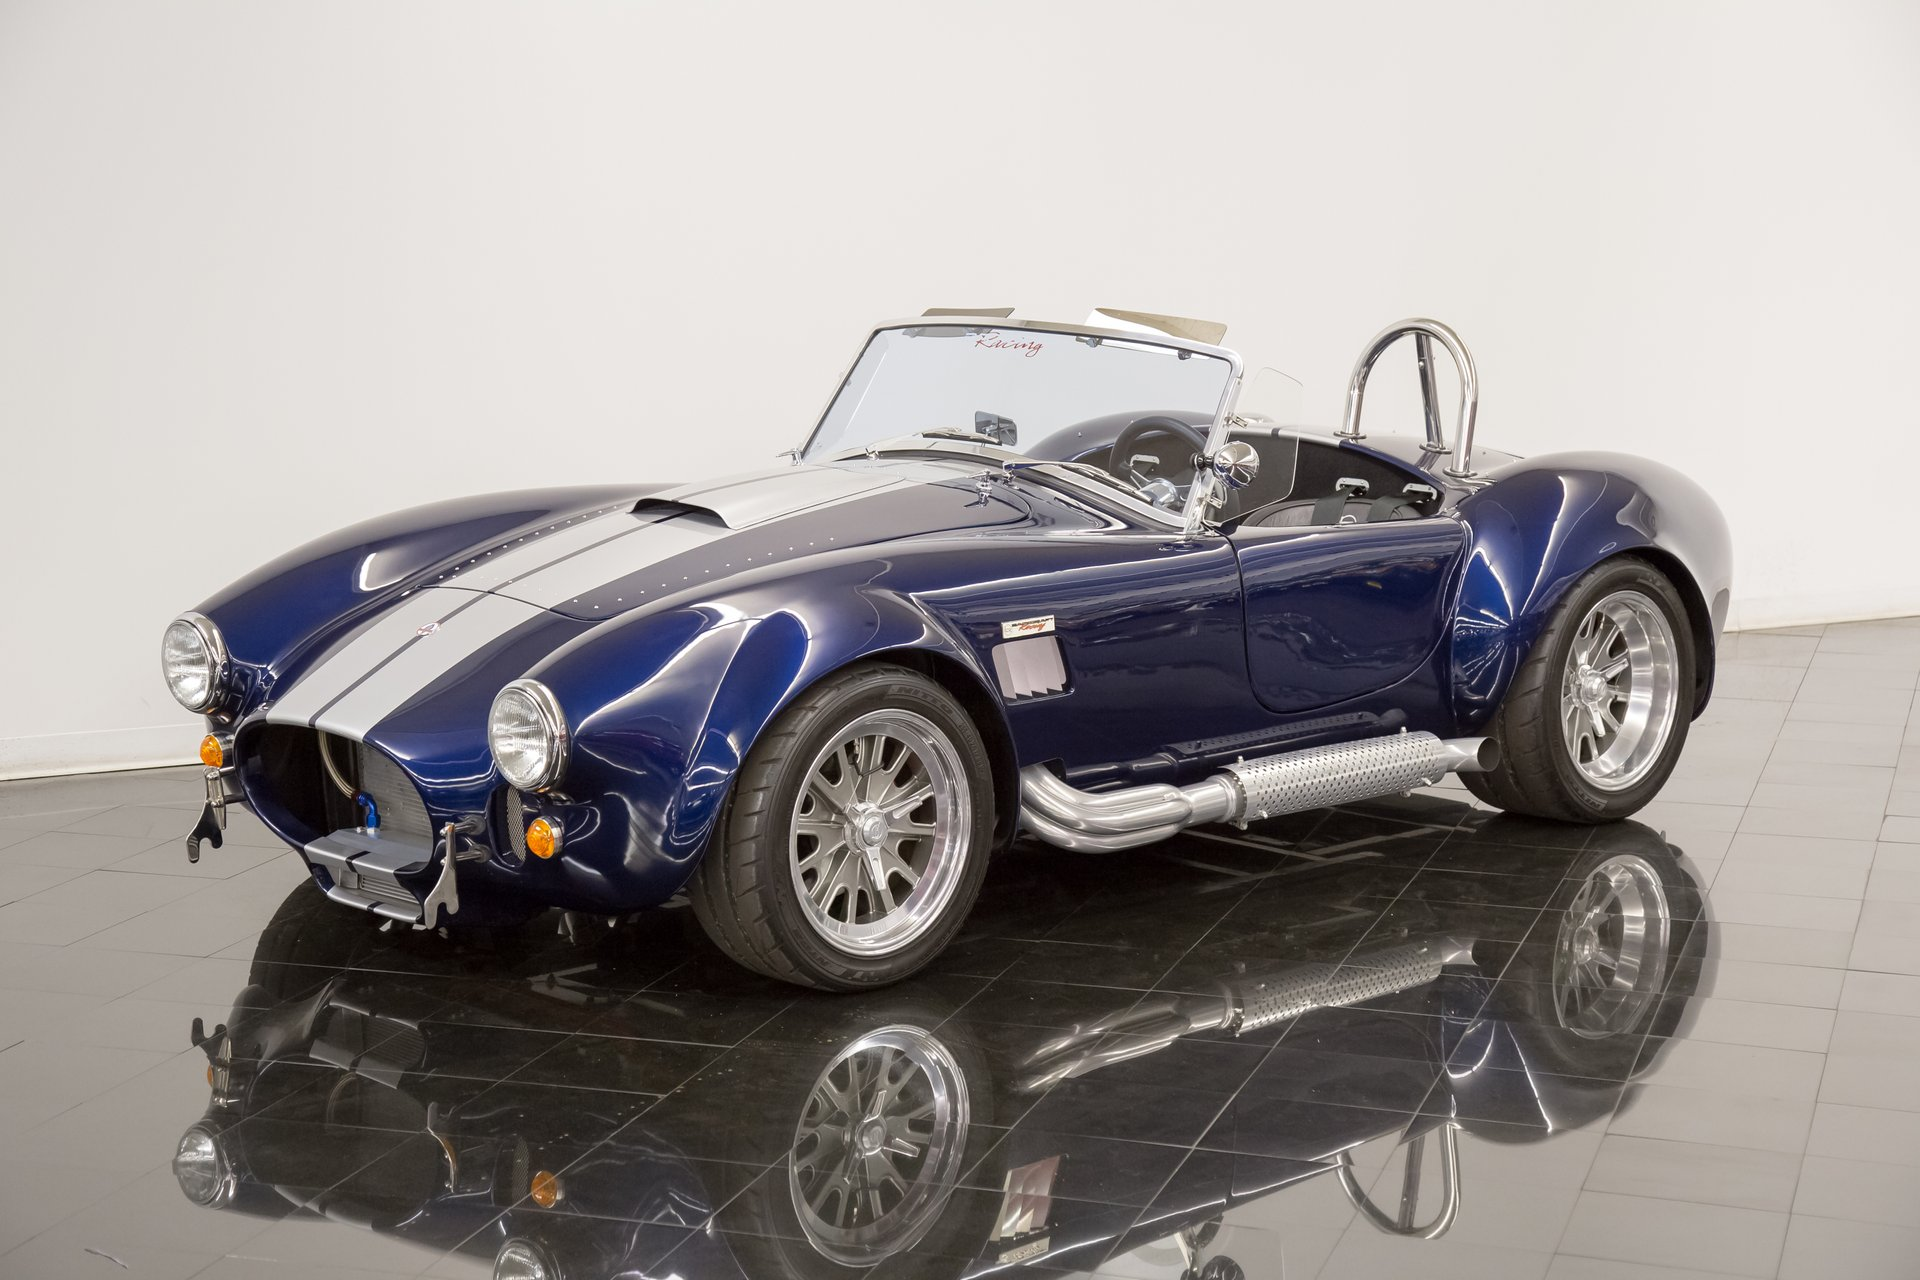 1965 shelby cobra replica by backdraft racing